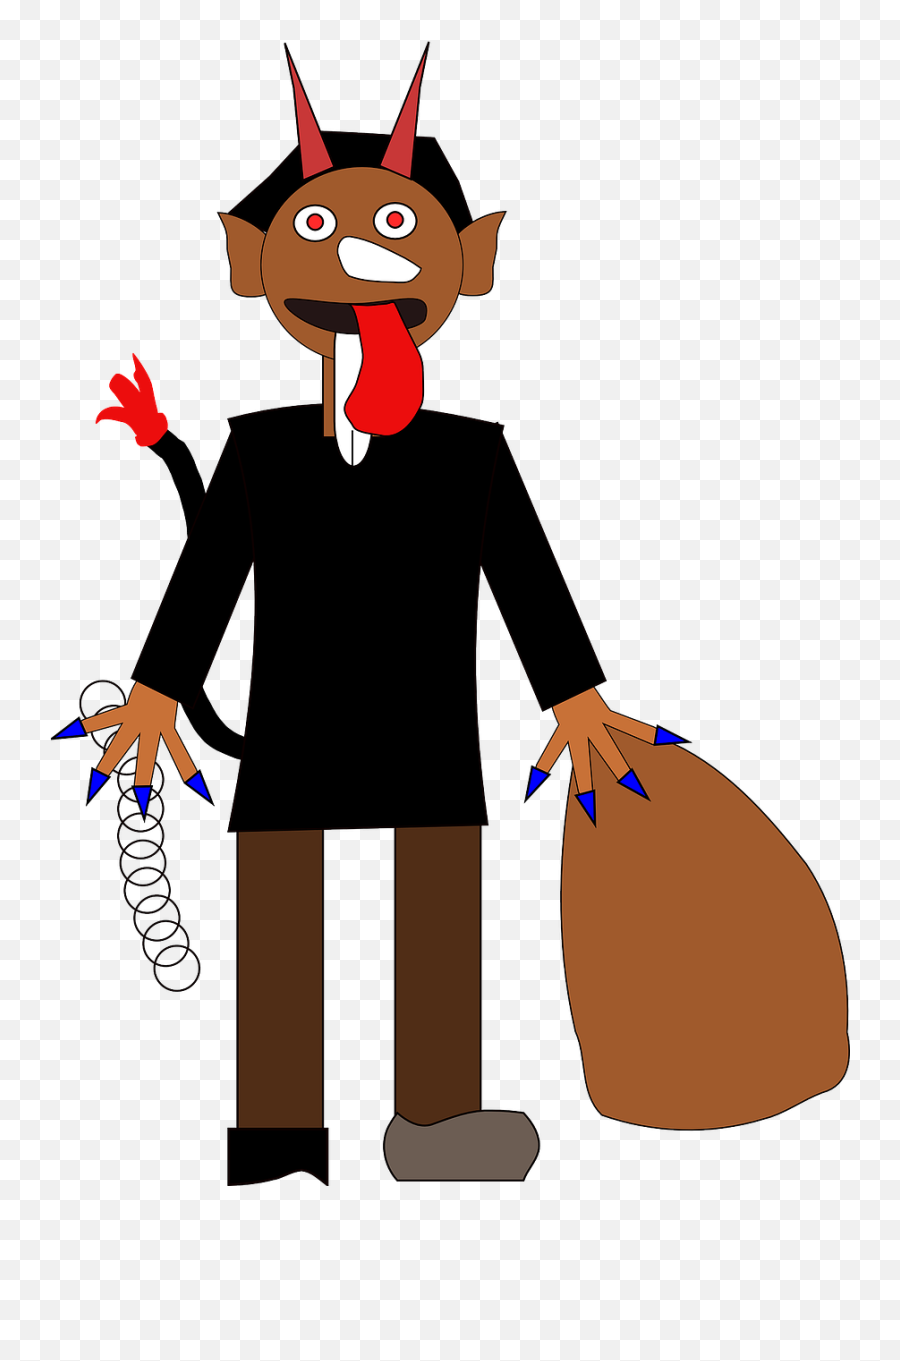 Devil Satan Haloween Costume Demon Evil - Evil Devil Cartoon Emoji